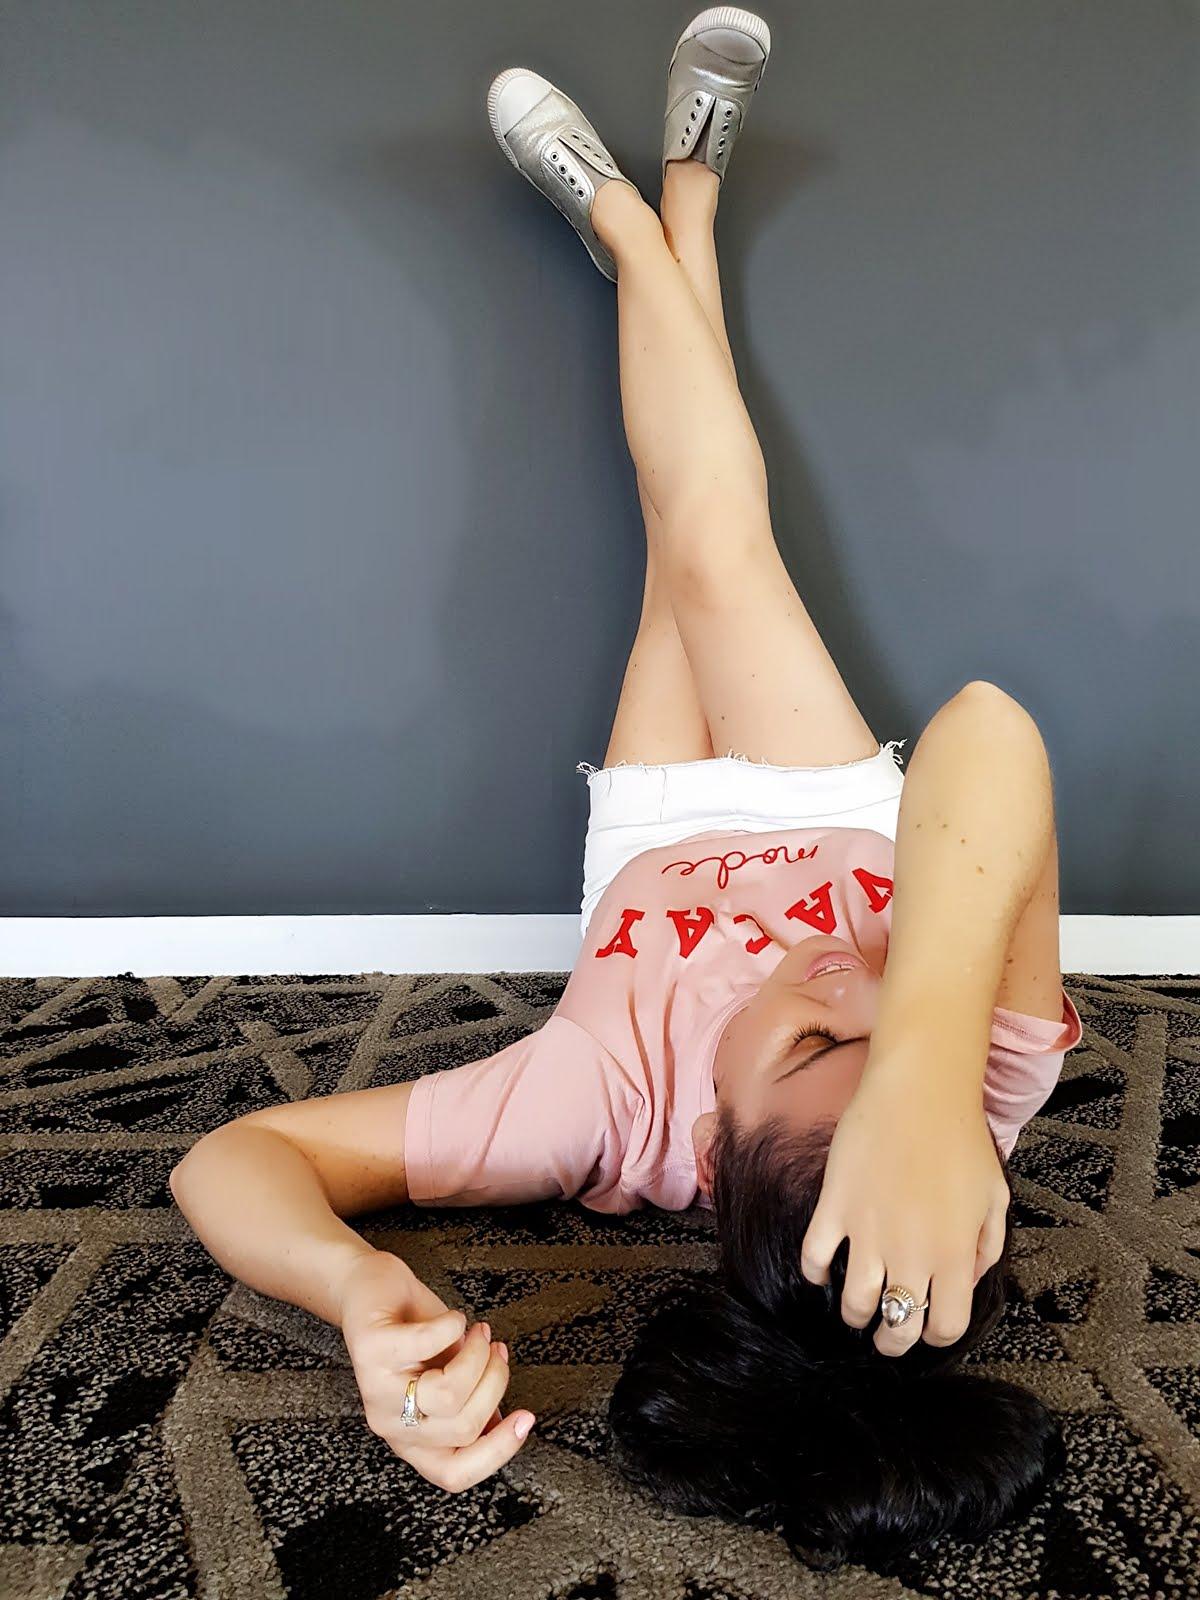 taking care feet self love beauty soul samantha clark waters blog upside down